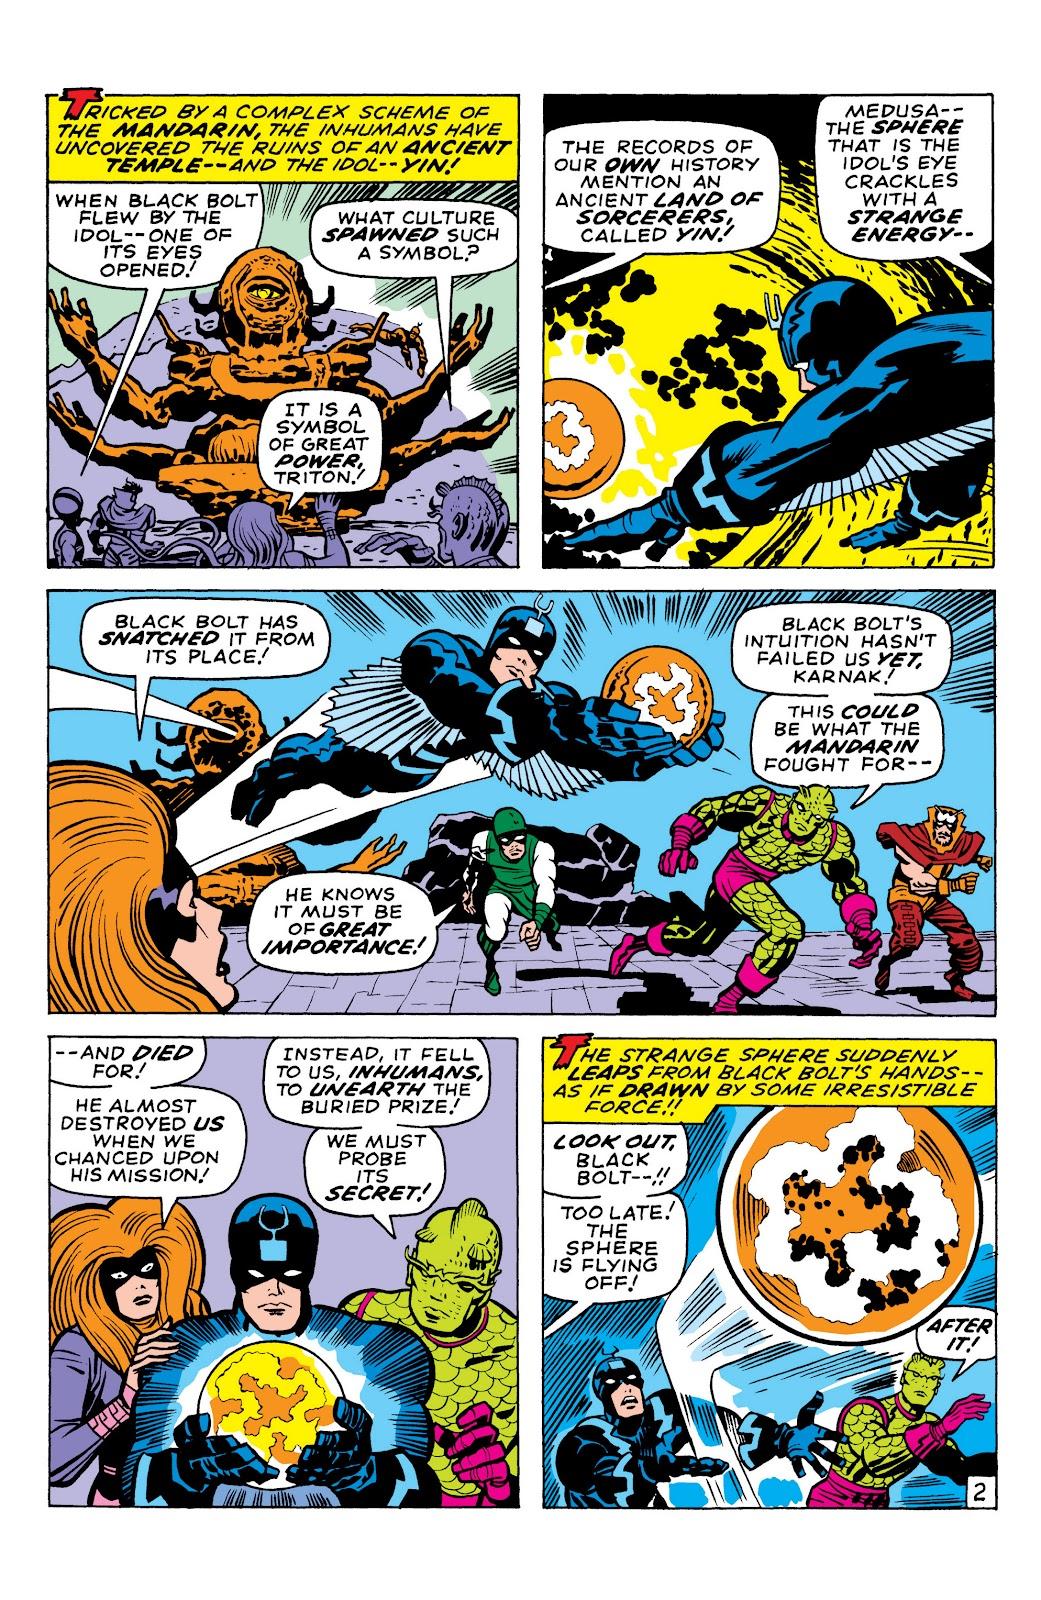 Read online Marvel Masterworks: The Inhumans comic -  Issue # TPB 1 (Part 2) - 4